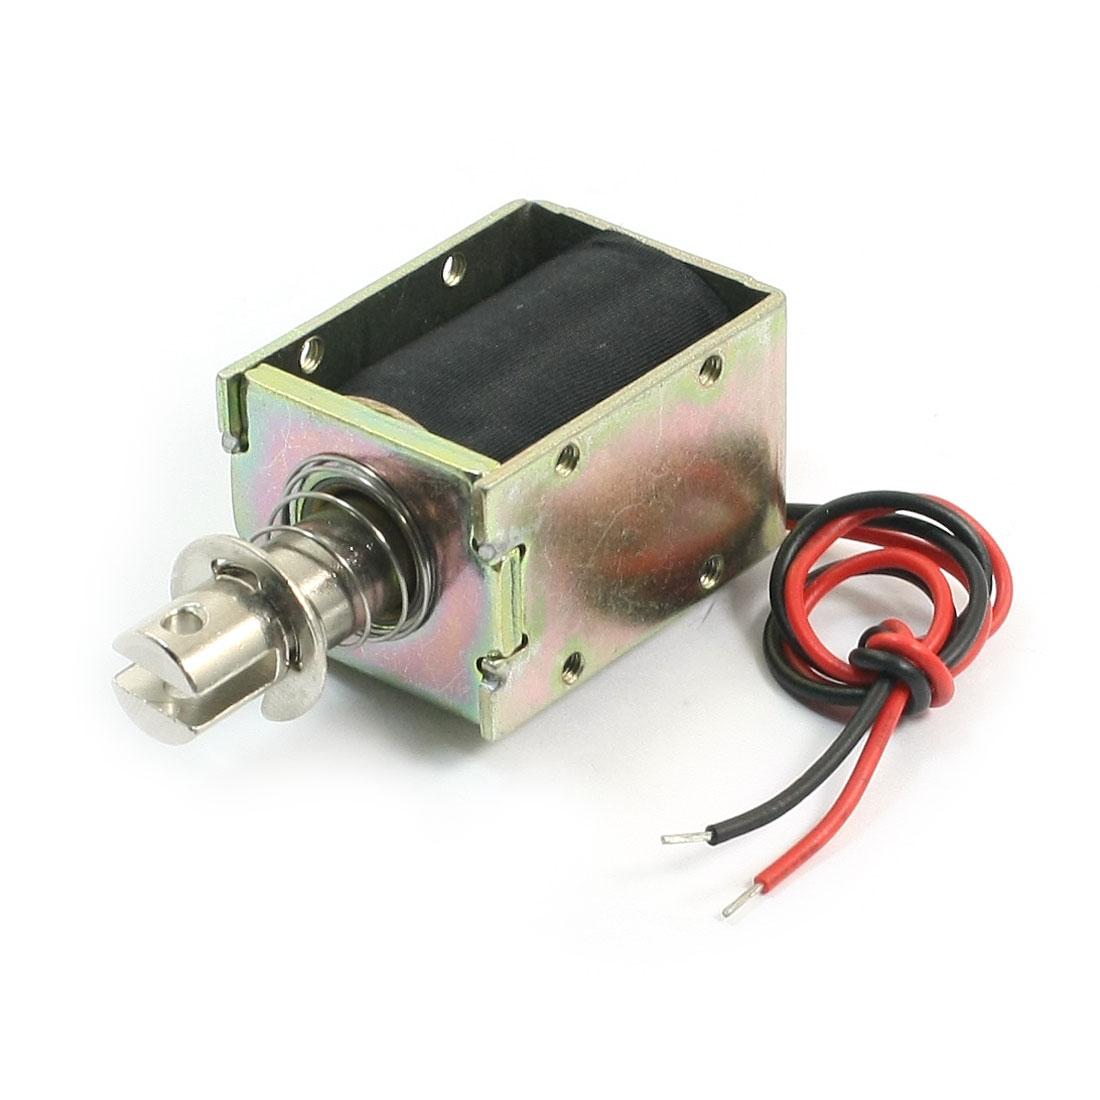 24V 96A 10mm Stroke 300gf Force Push Pull Type Open Frame Spring Plunger DC Solenoid Electromagnet